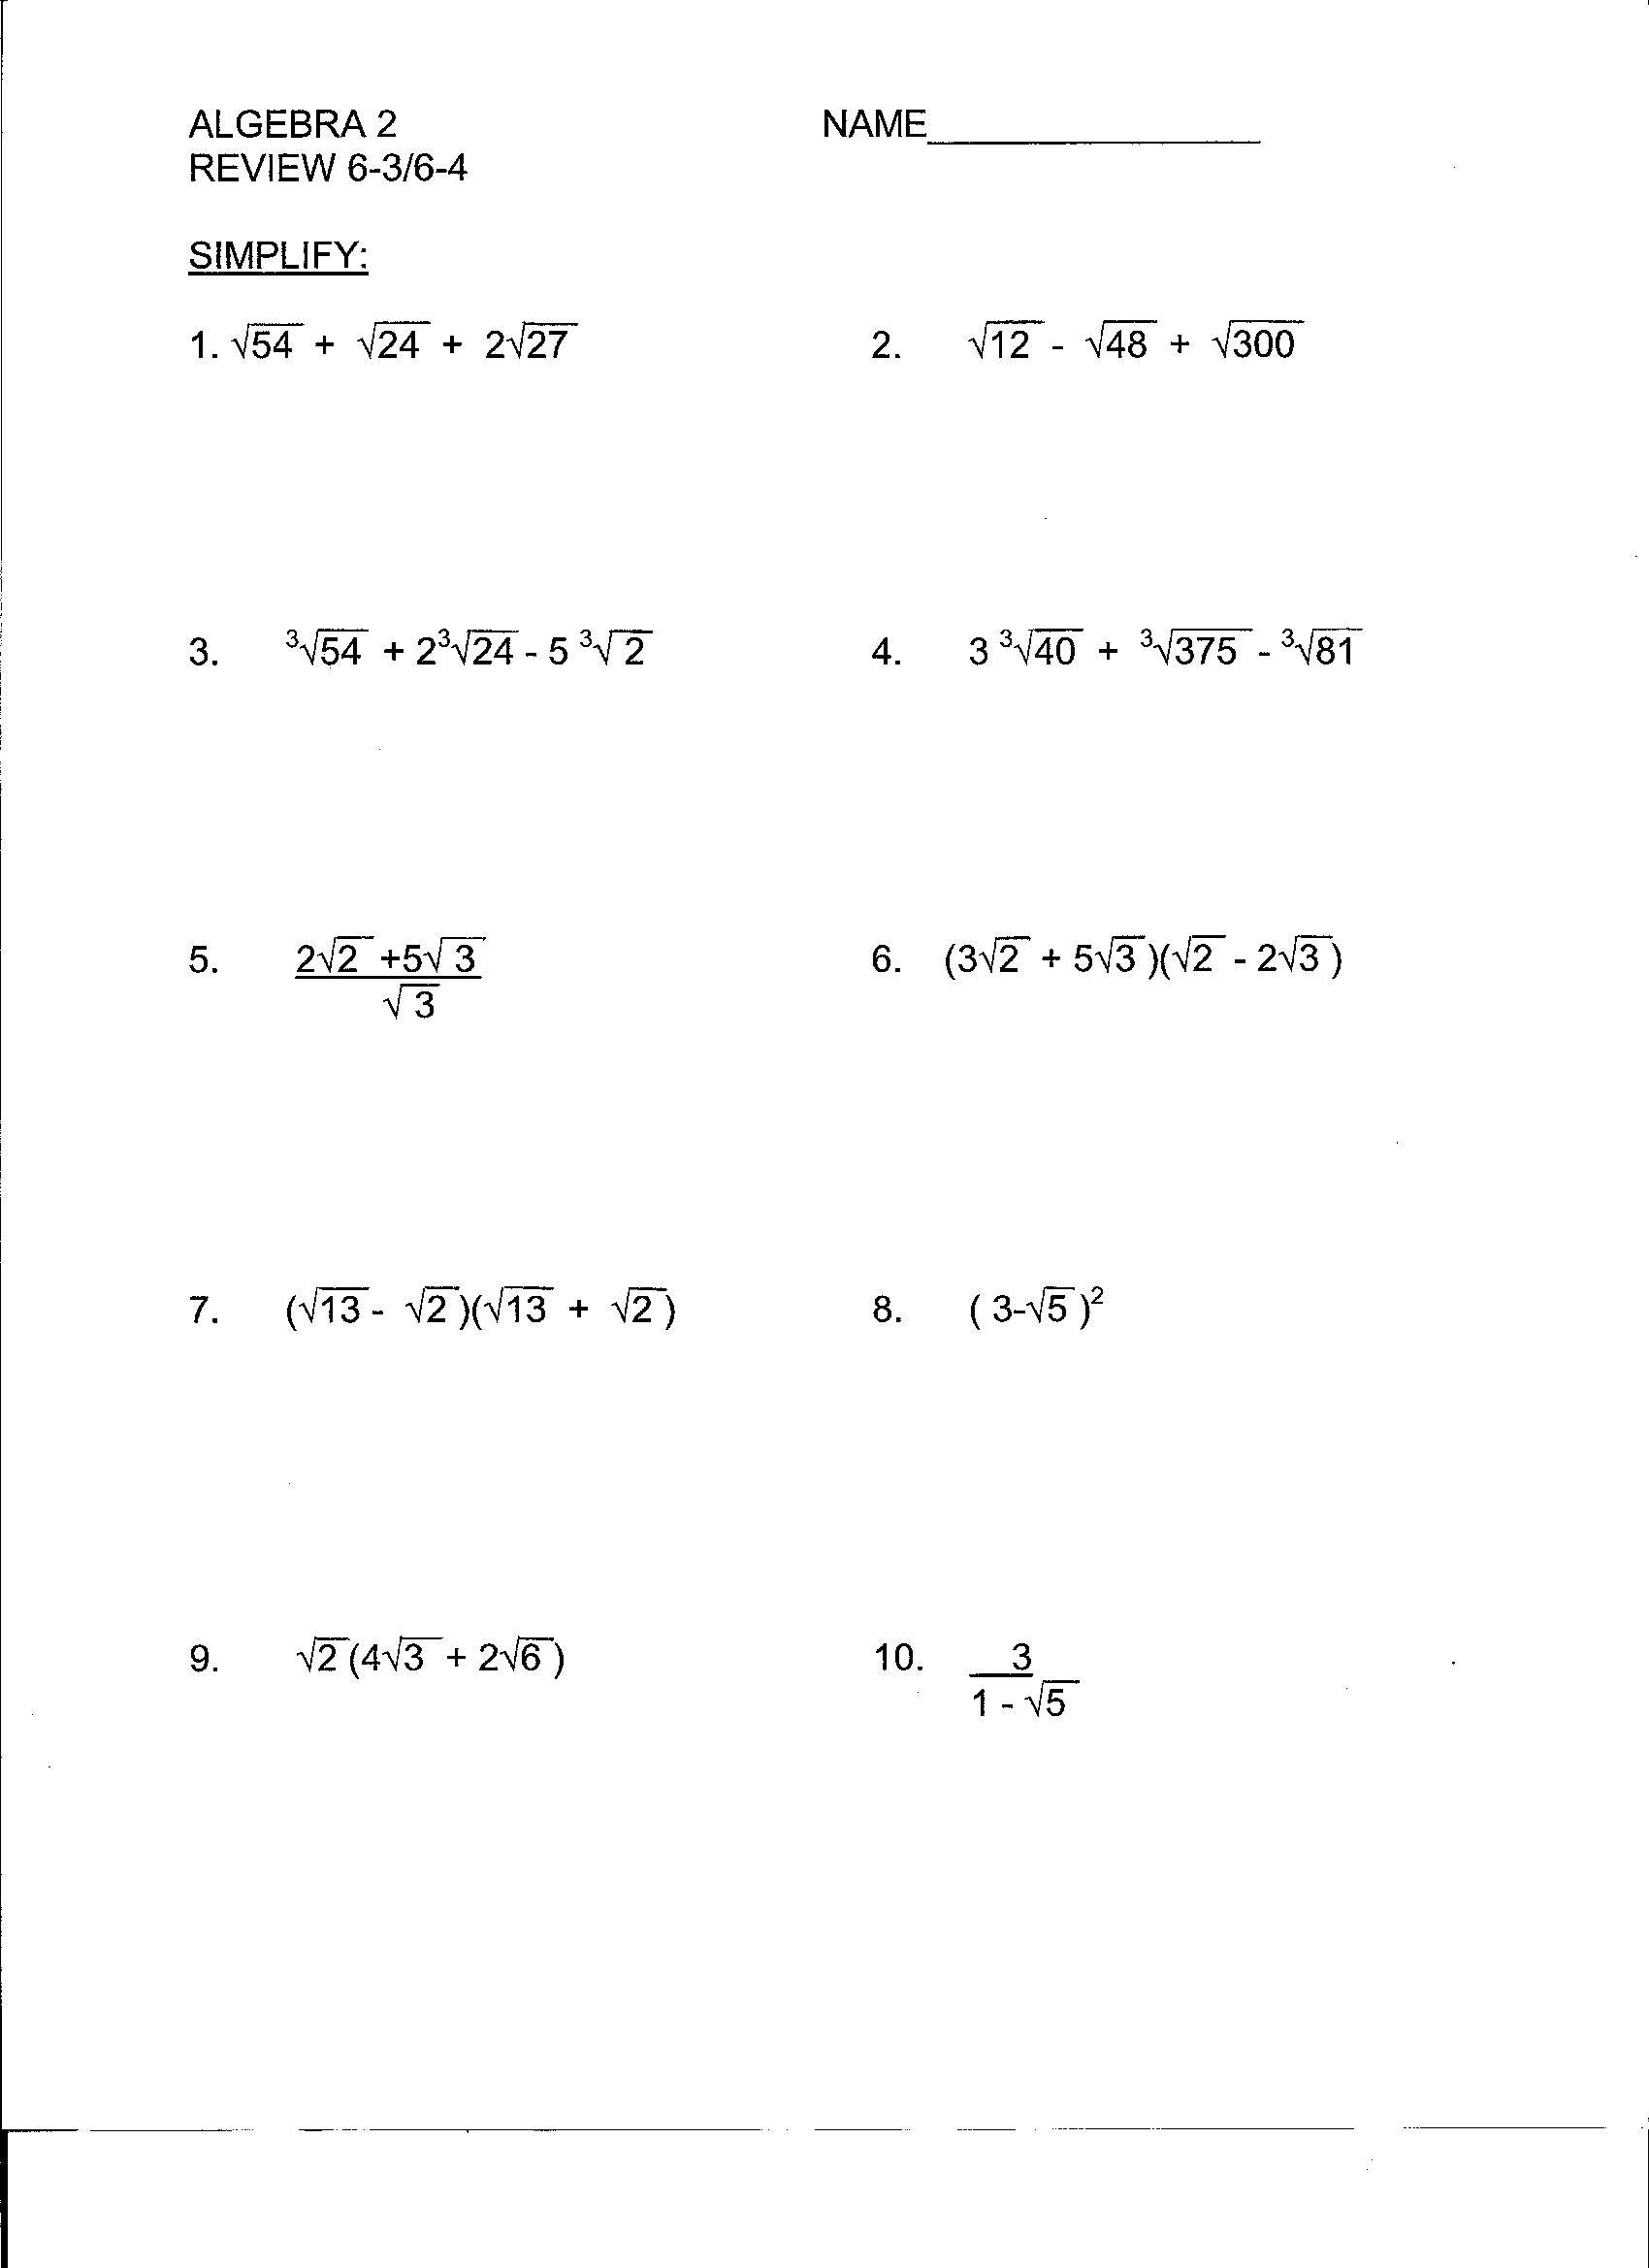 Algebra 1 Review Worksheet Beunier Smith Yvette College Algebra Documents